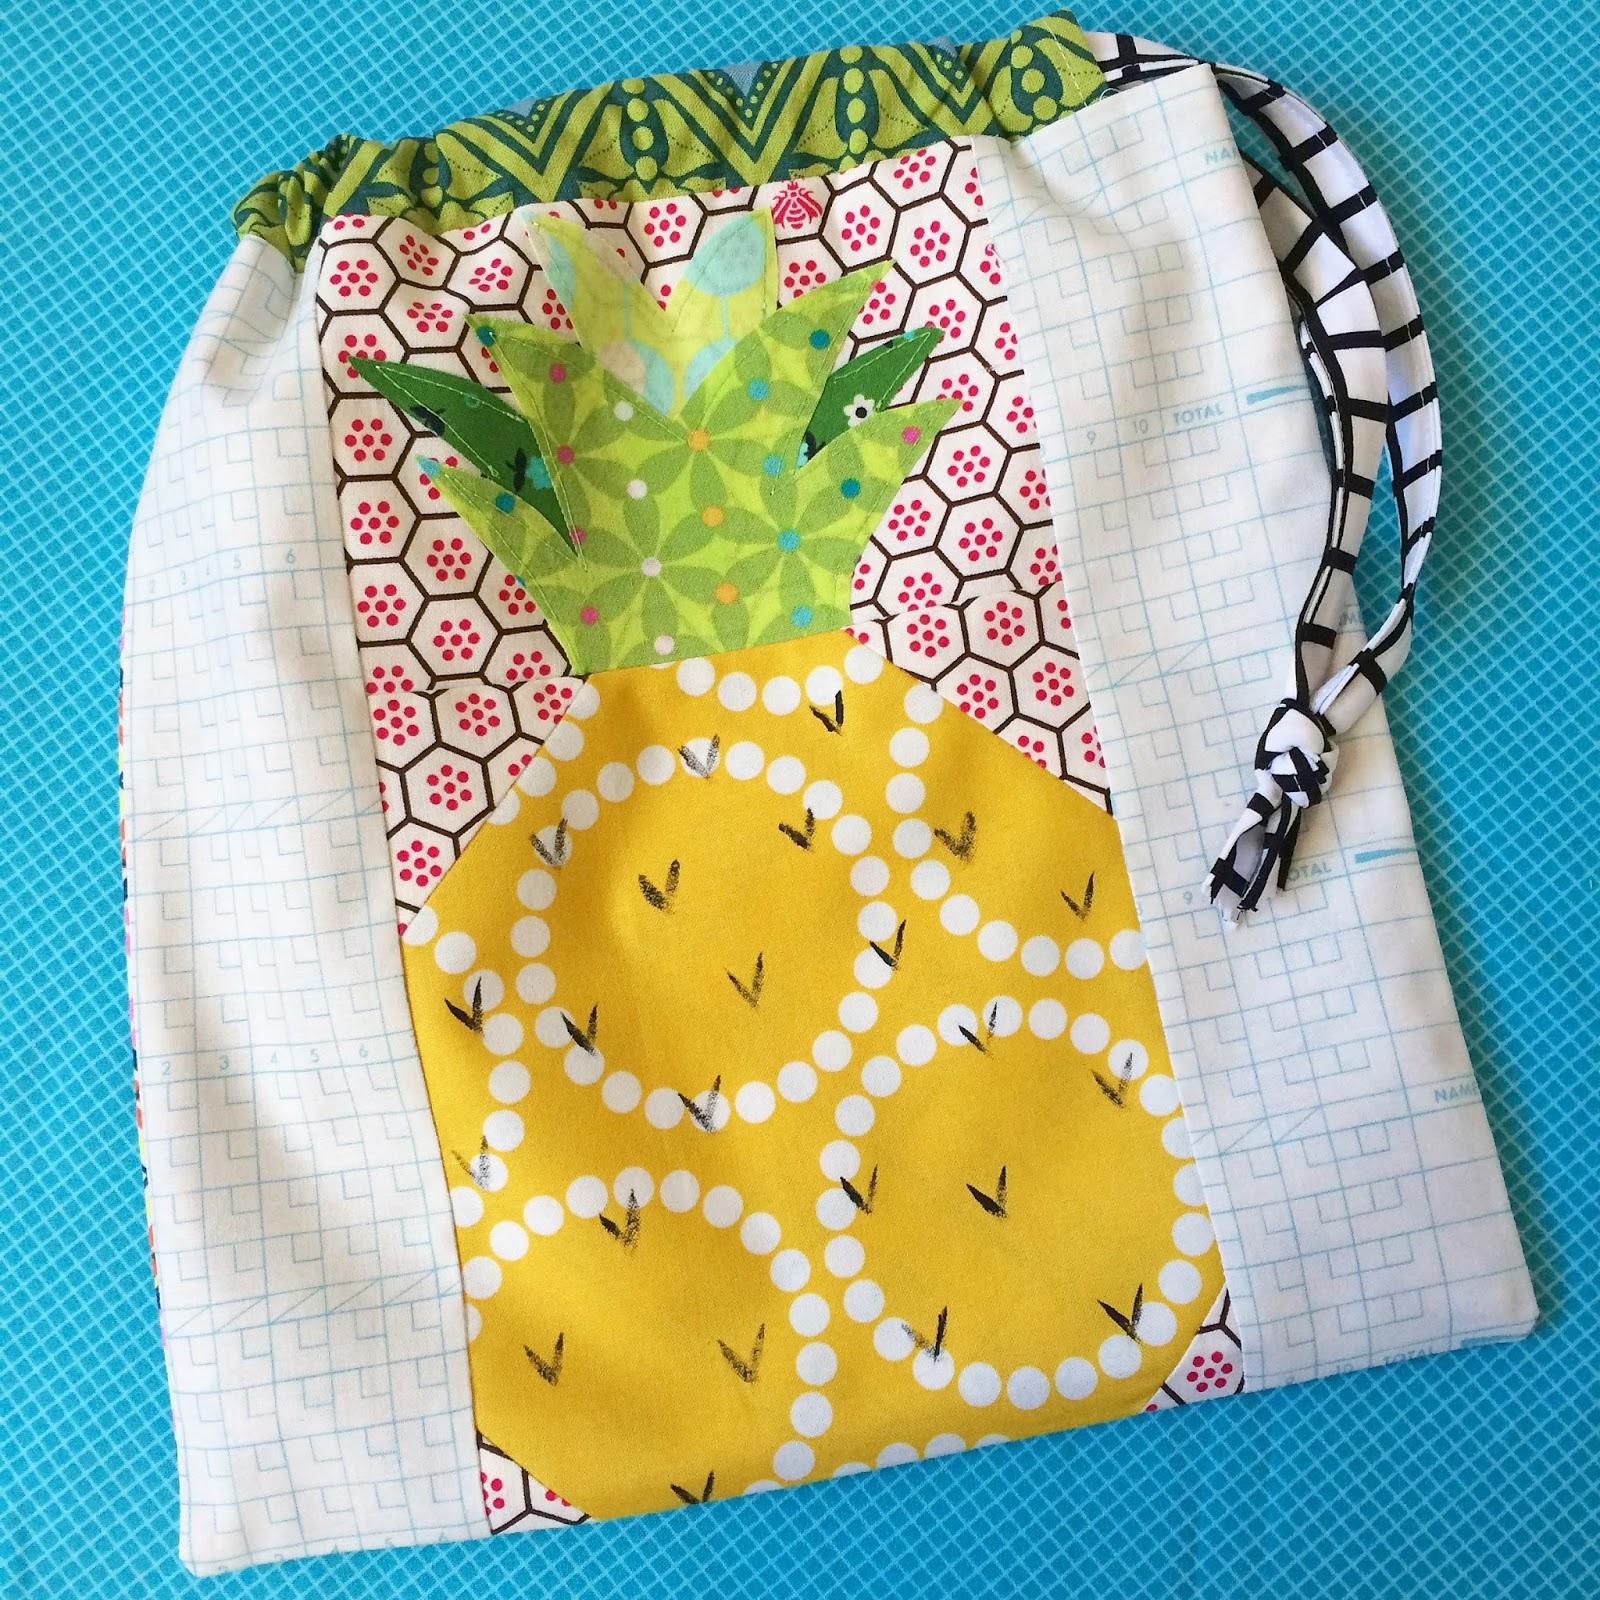 Euphoria Jessica: The Pineapple Drawstring Bag- A Tutorial